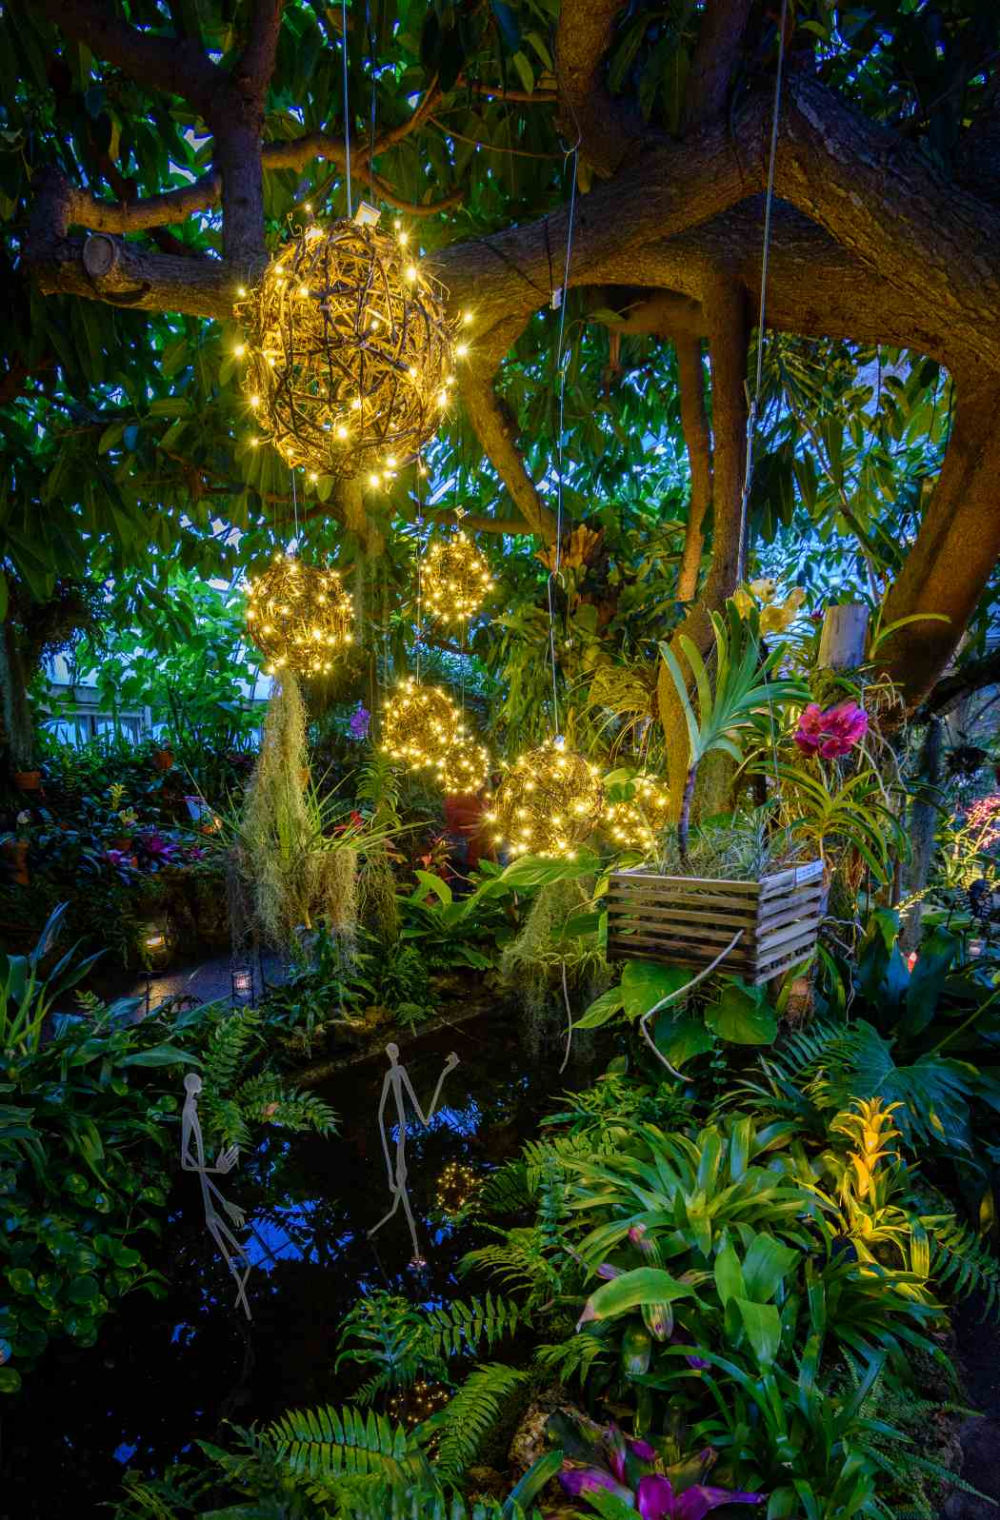 7996b0ae8ea0b6d91d773da8d1e03422 - Light Show Botanical Gardens St Louis